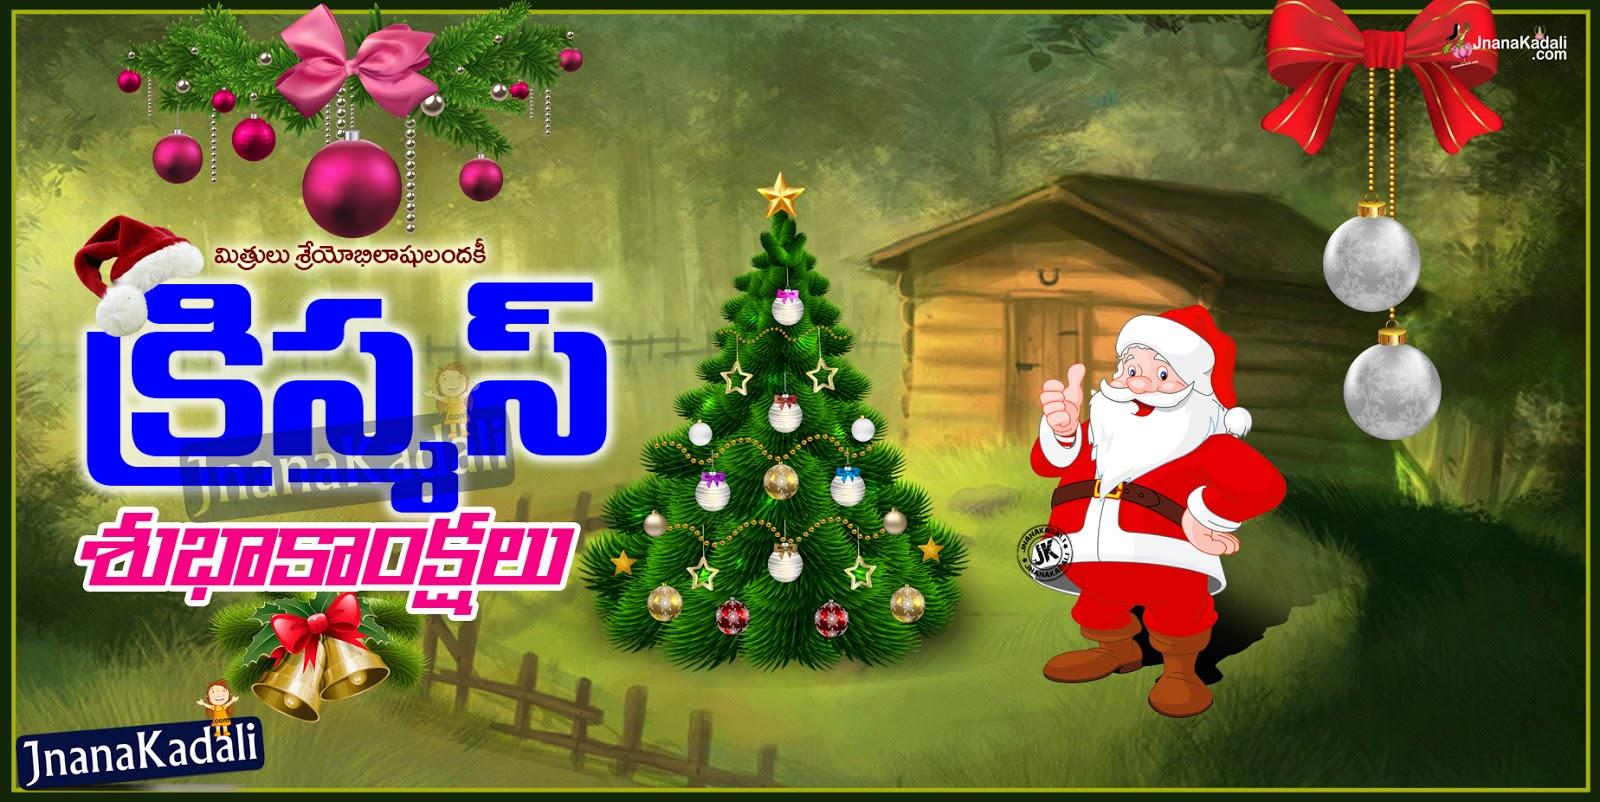 November 2015 Jnana Kadali Com Telugu Quotes English